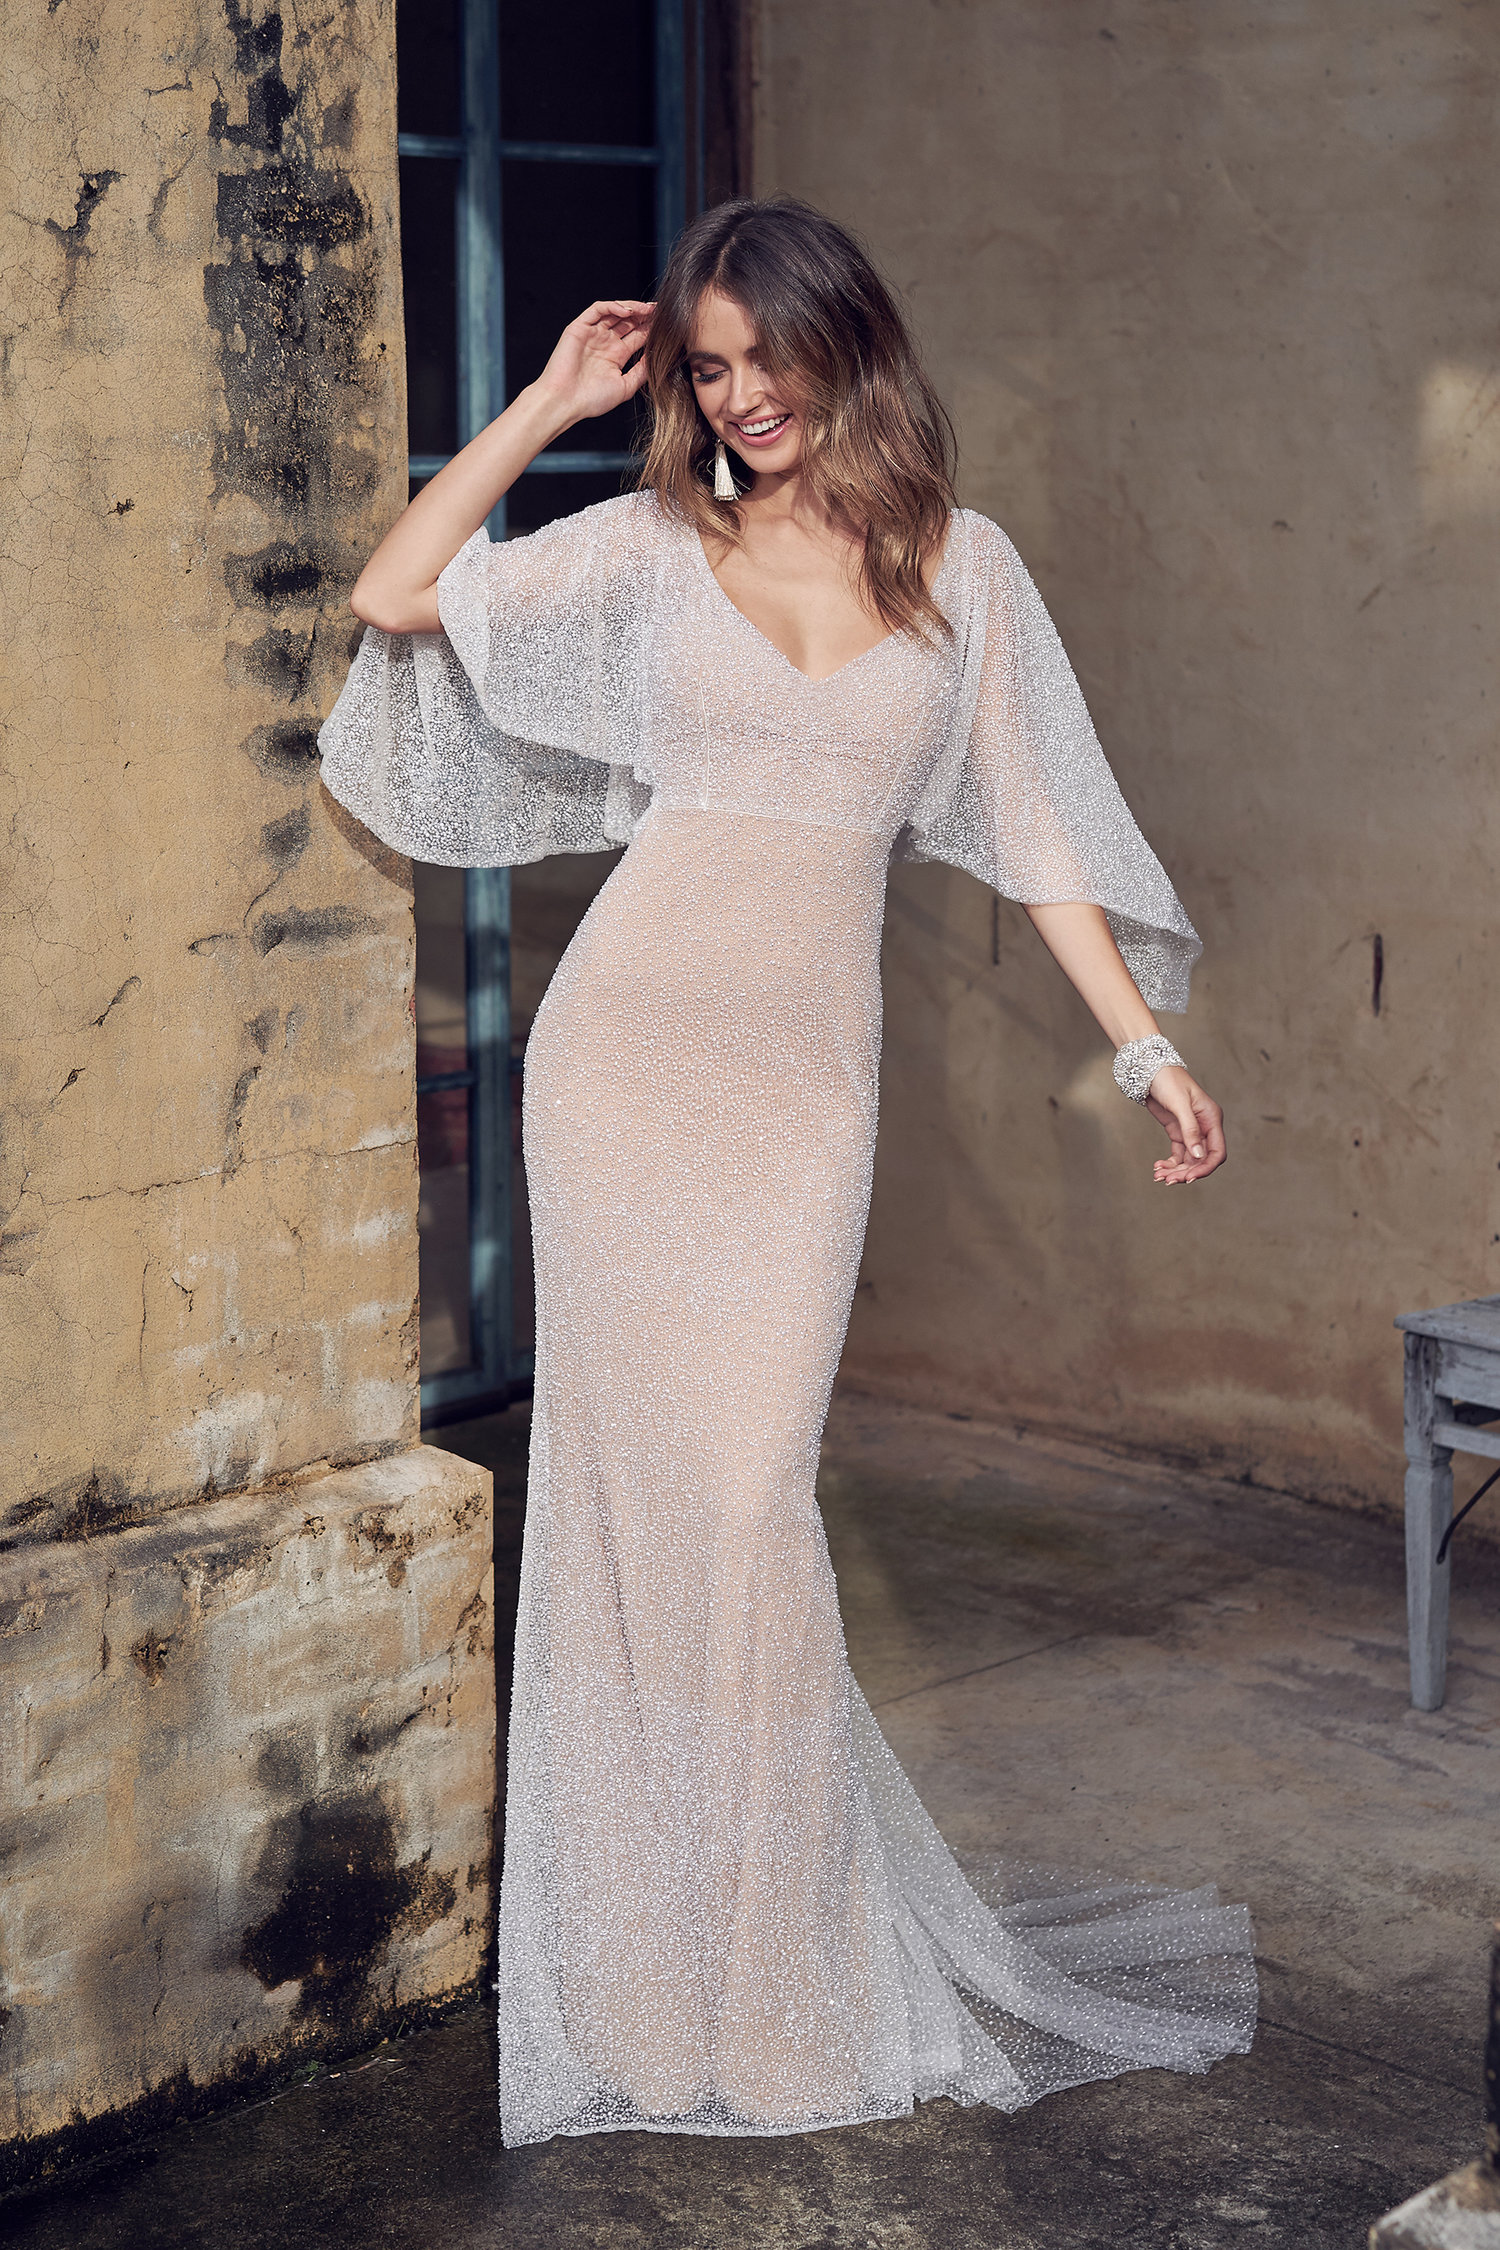 Wanda+Dress+(Draped+Sleeve)-5.jpeg